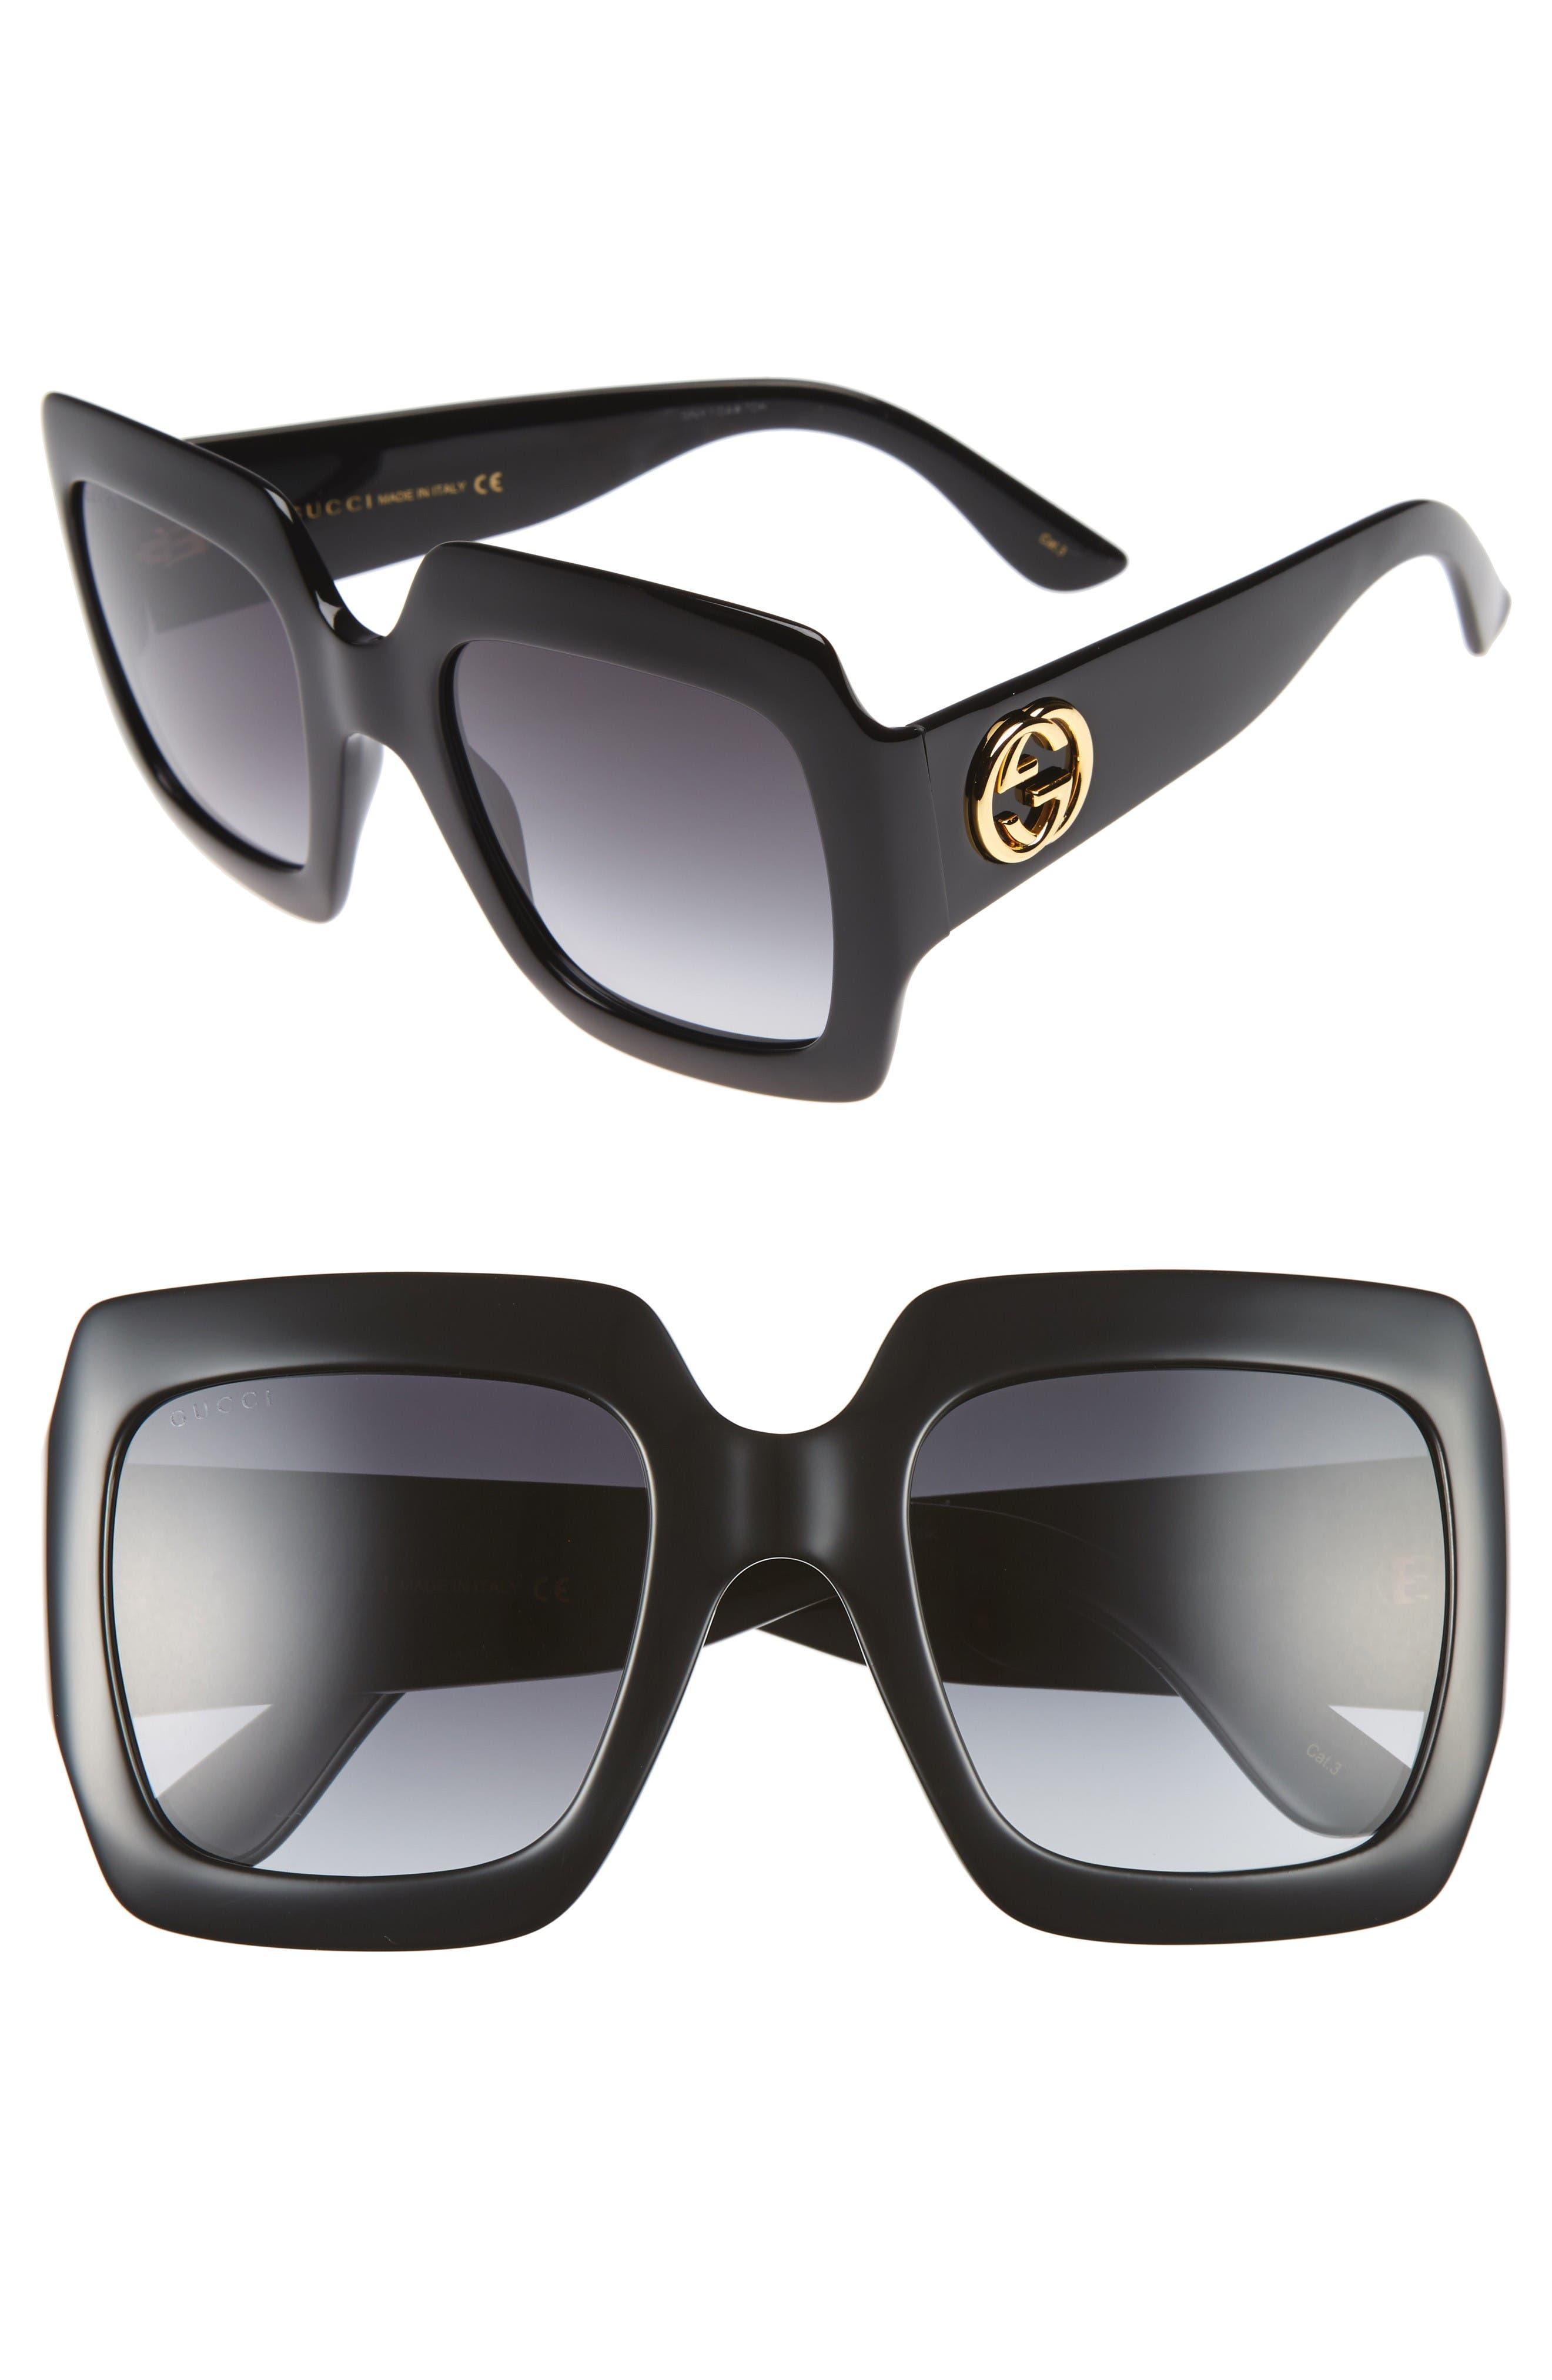 54mm Square Sunglasses,                         Main,                         color, Black/ Grey